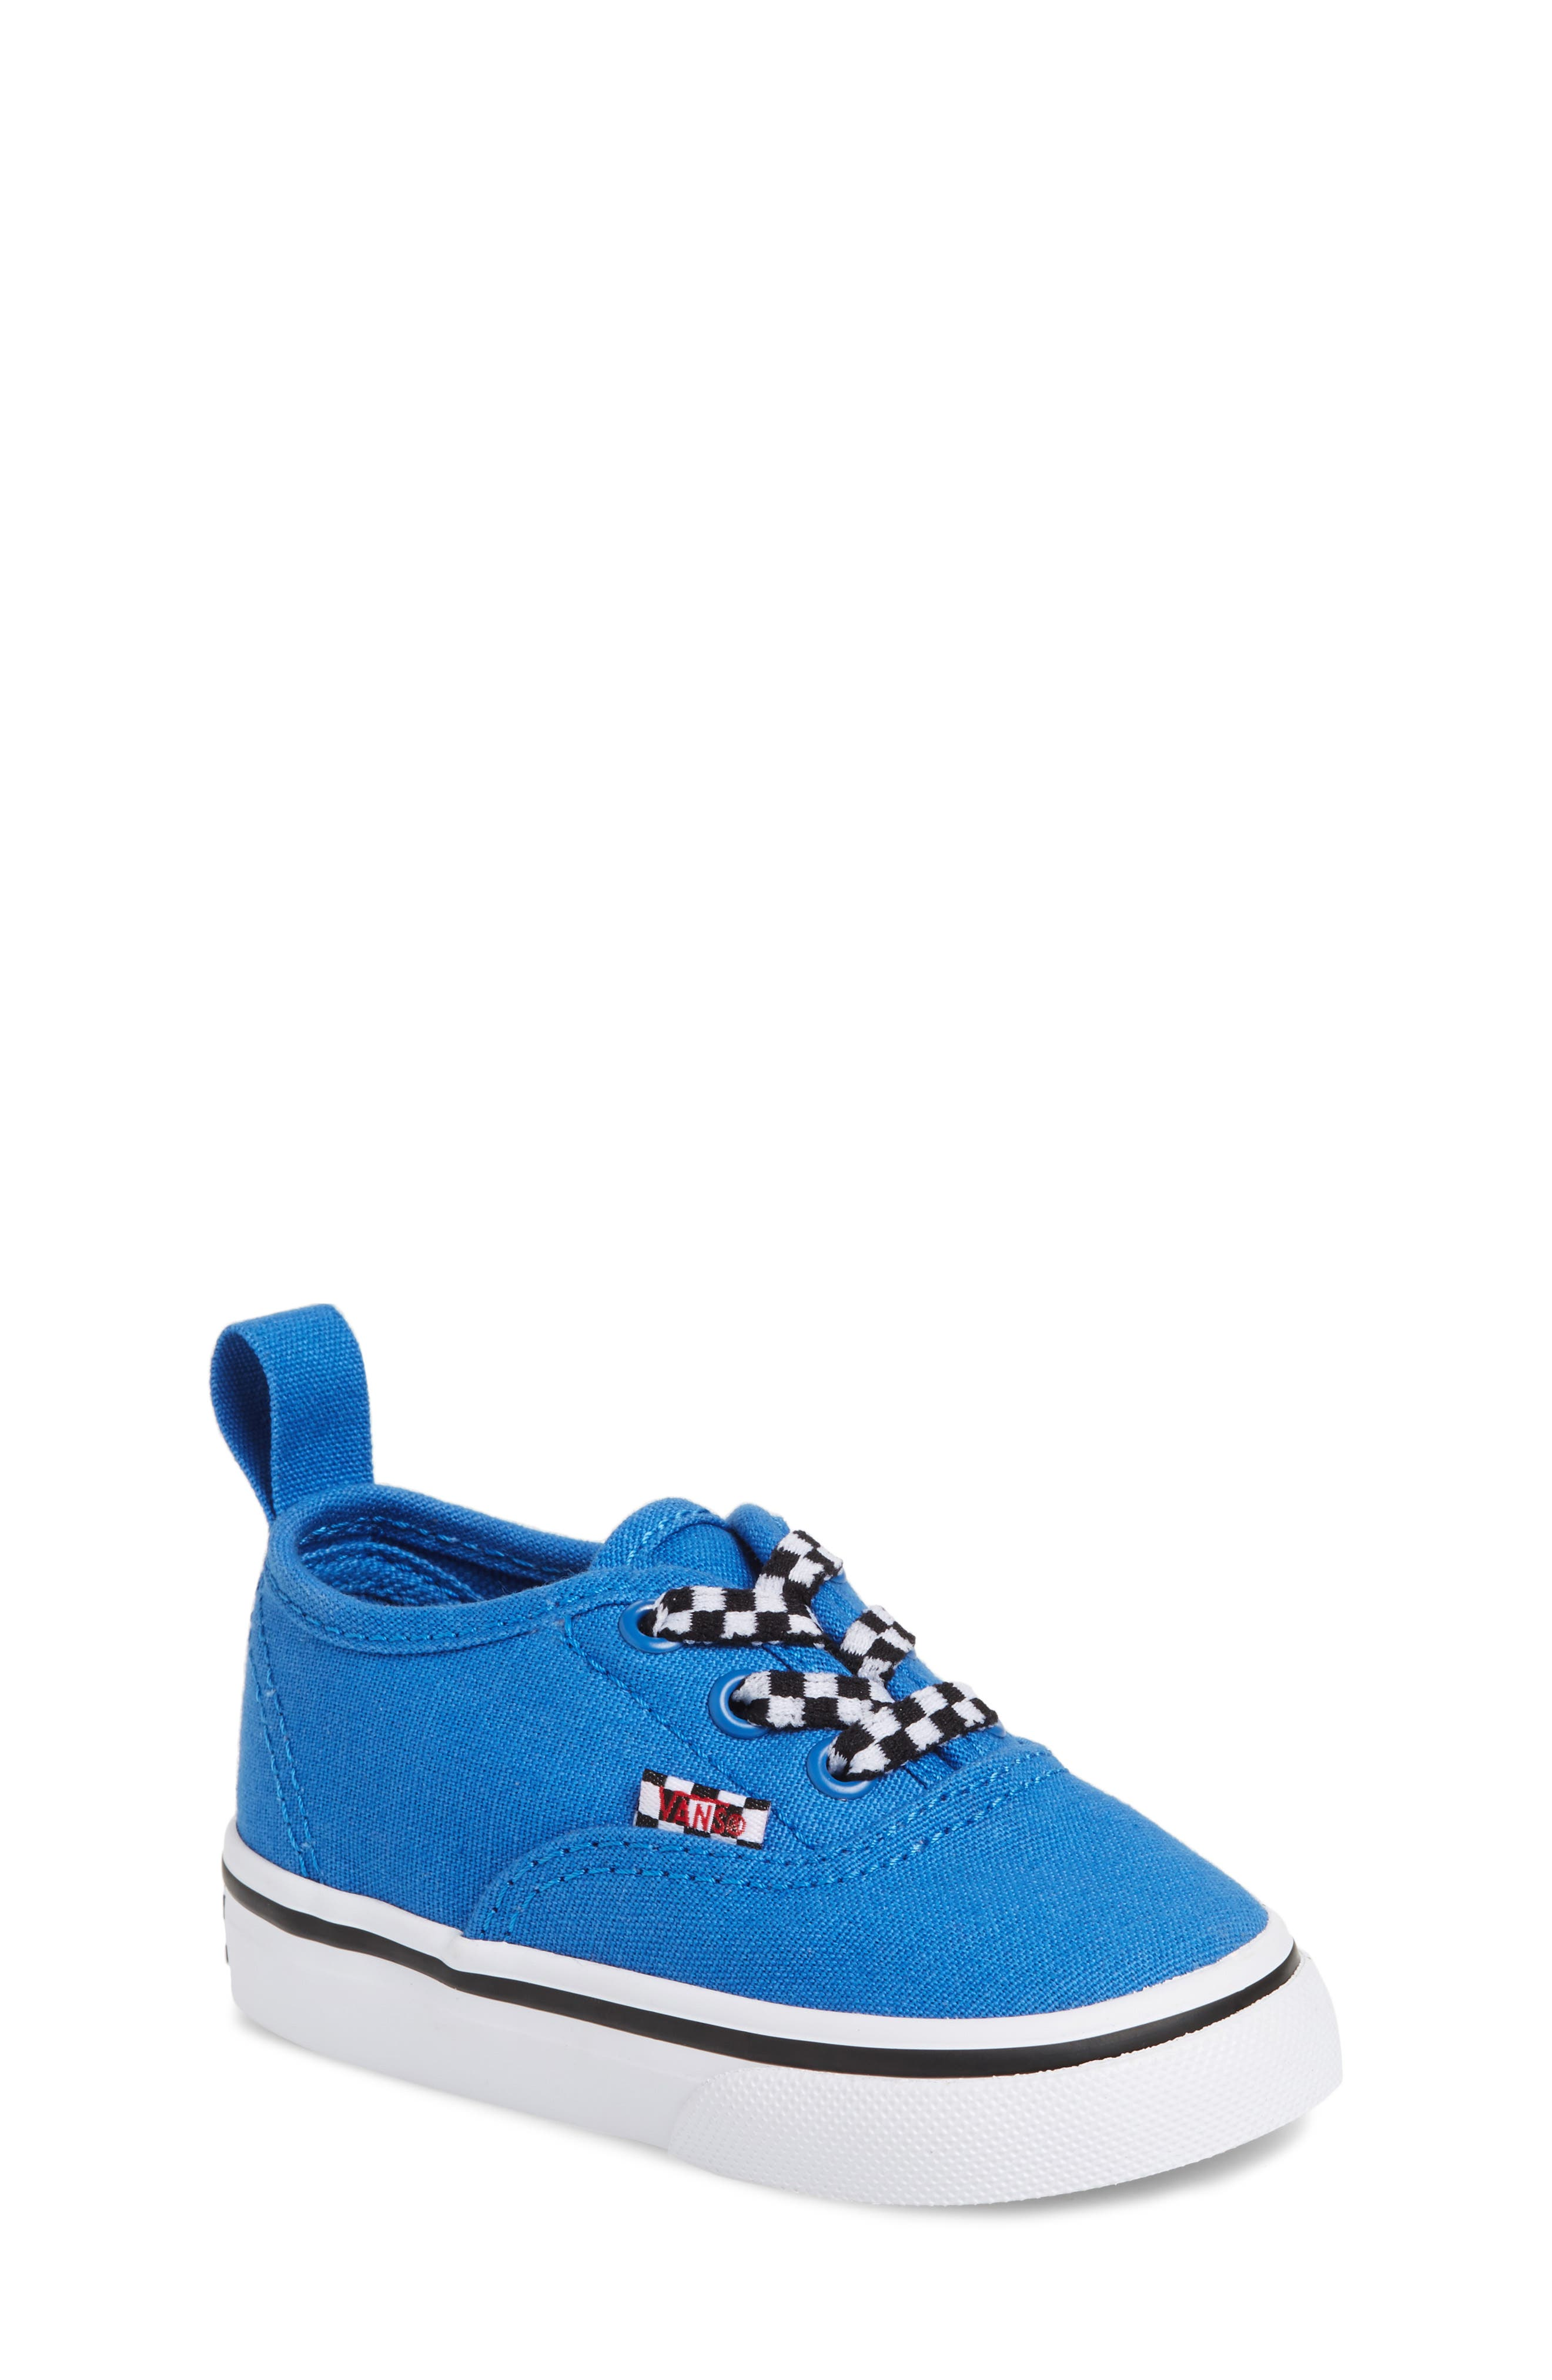 Authentic Sneaker,                             Main thumbnail 1, color,                             Blue/ White Check Lace